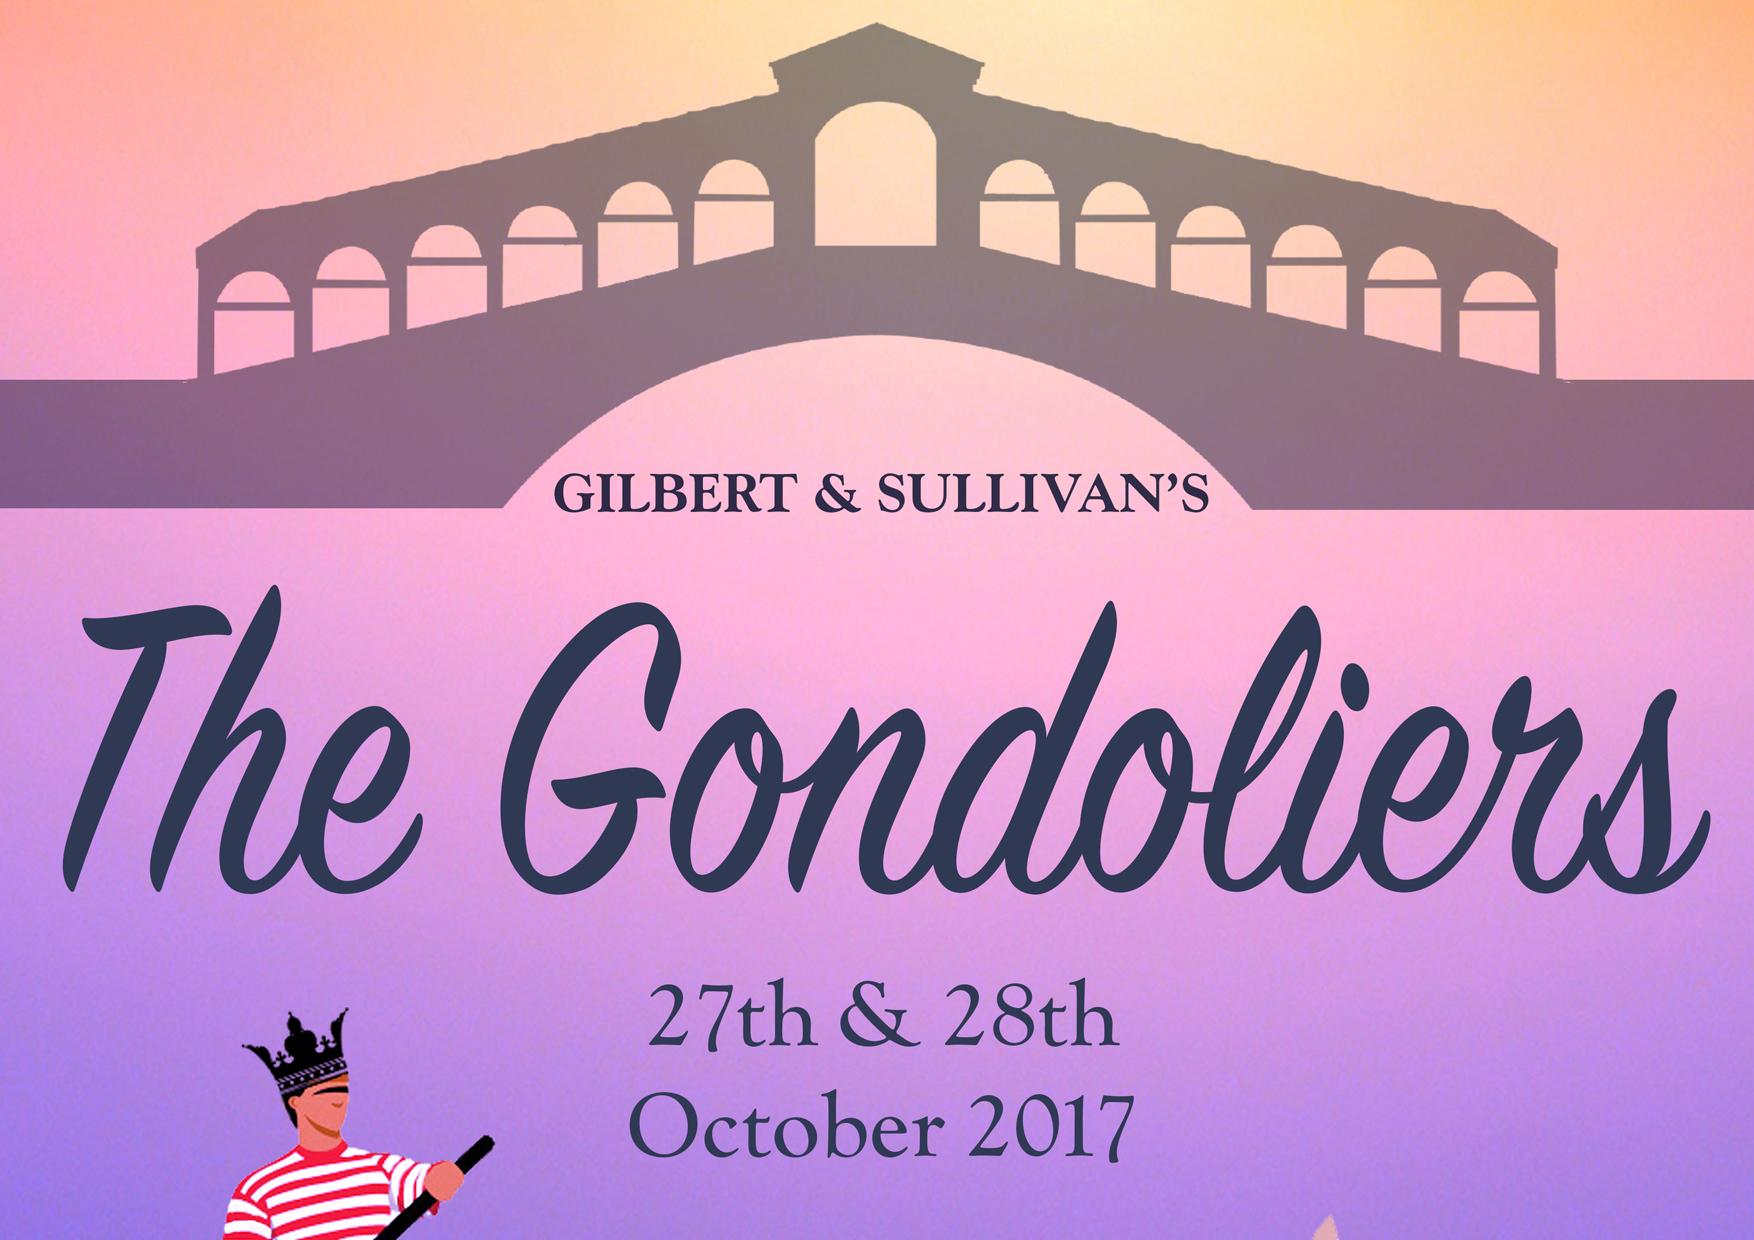 North West Opera present Gilbert & Sullivan's The Gondoliers